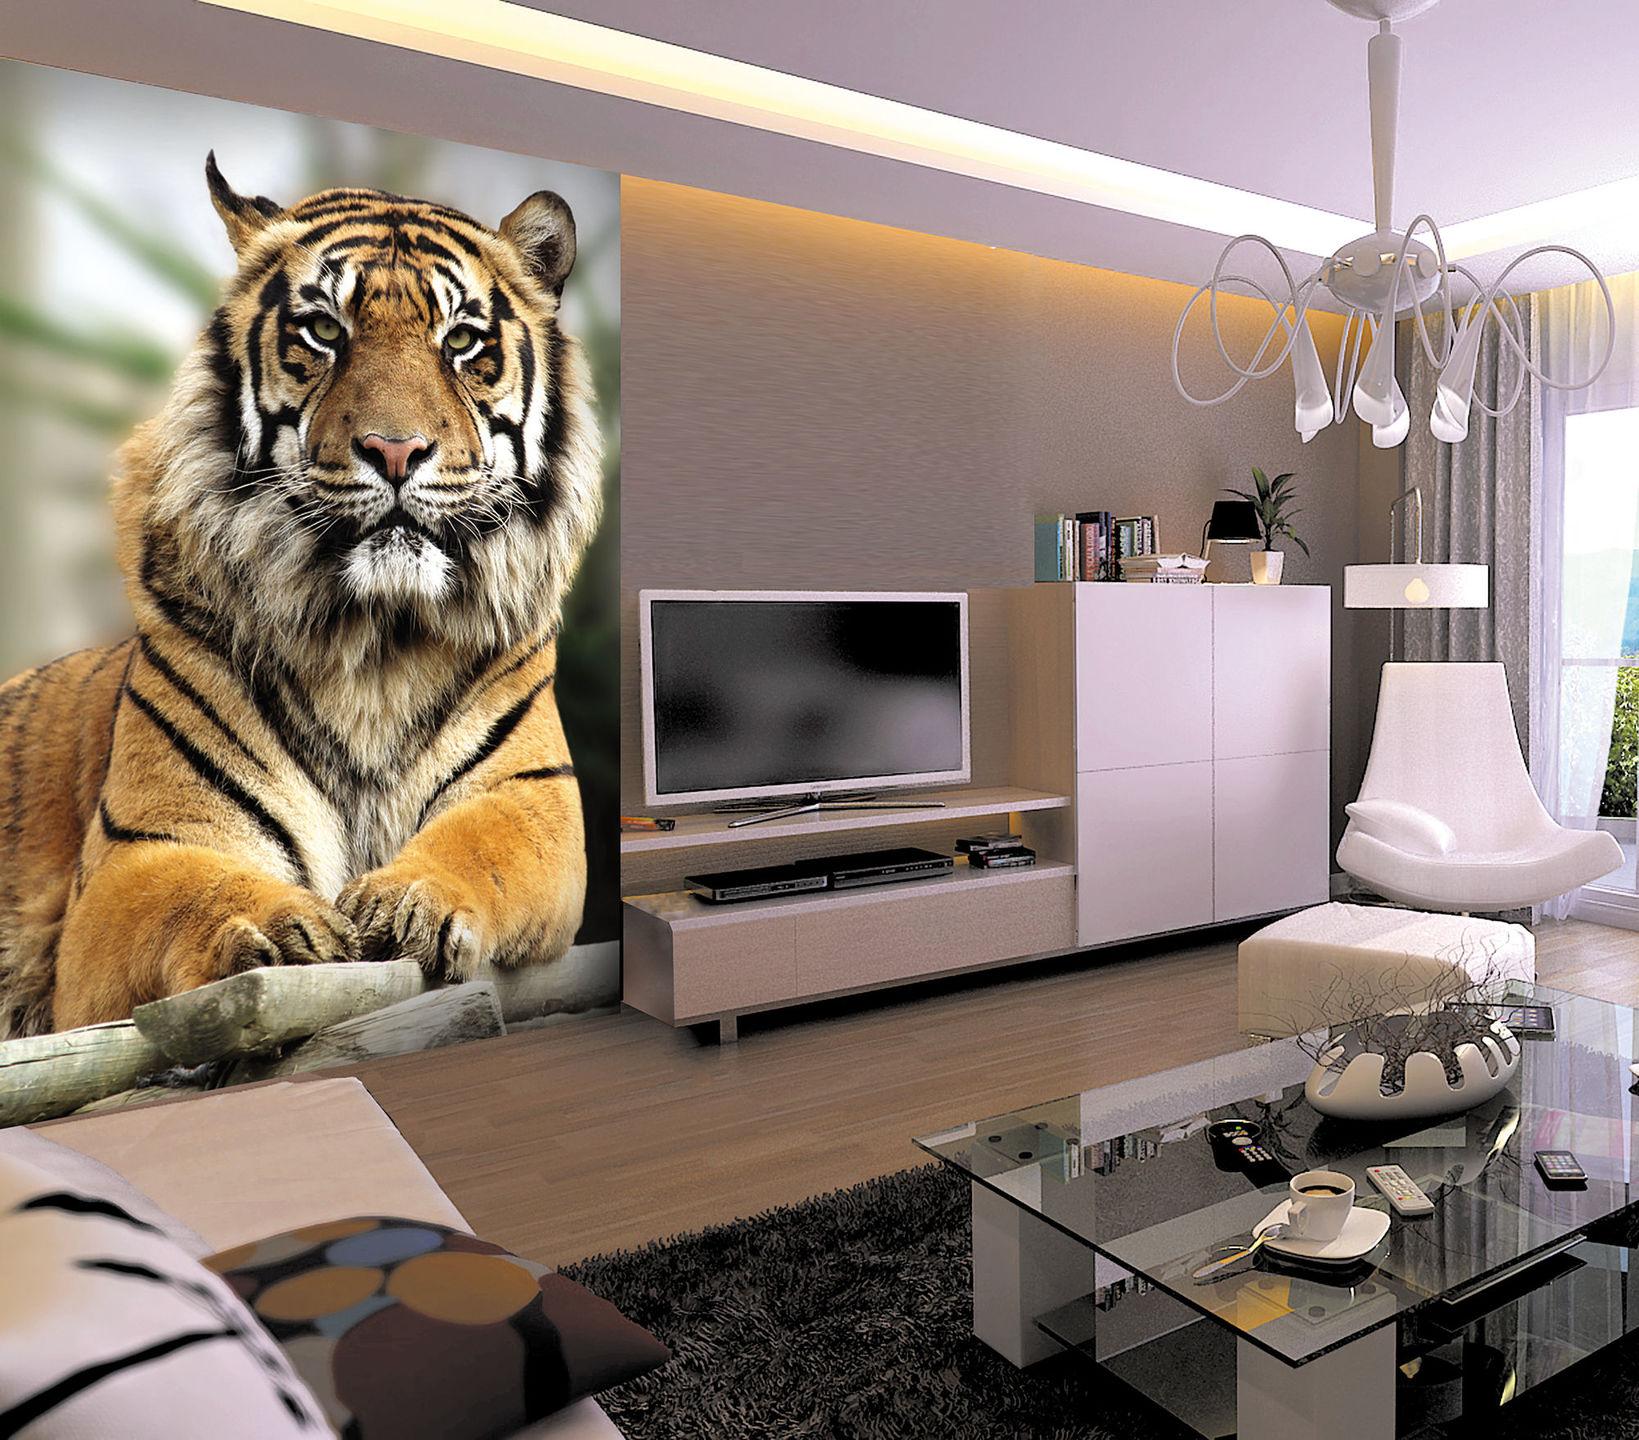 картинки на стену тигр рисунок вазы фруктами